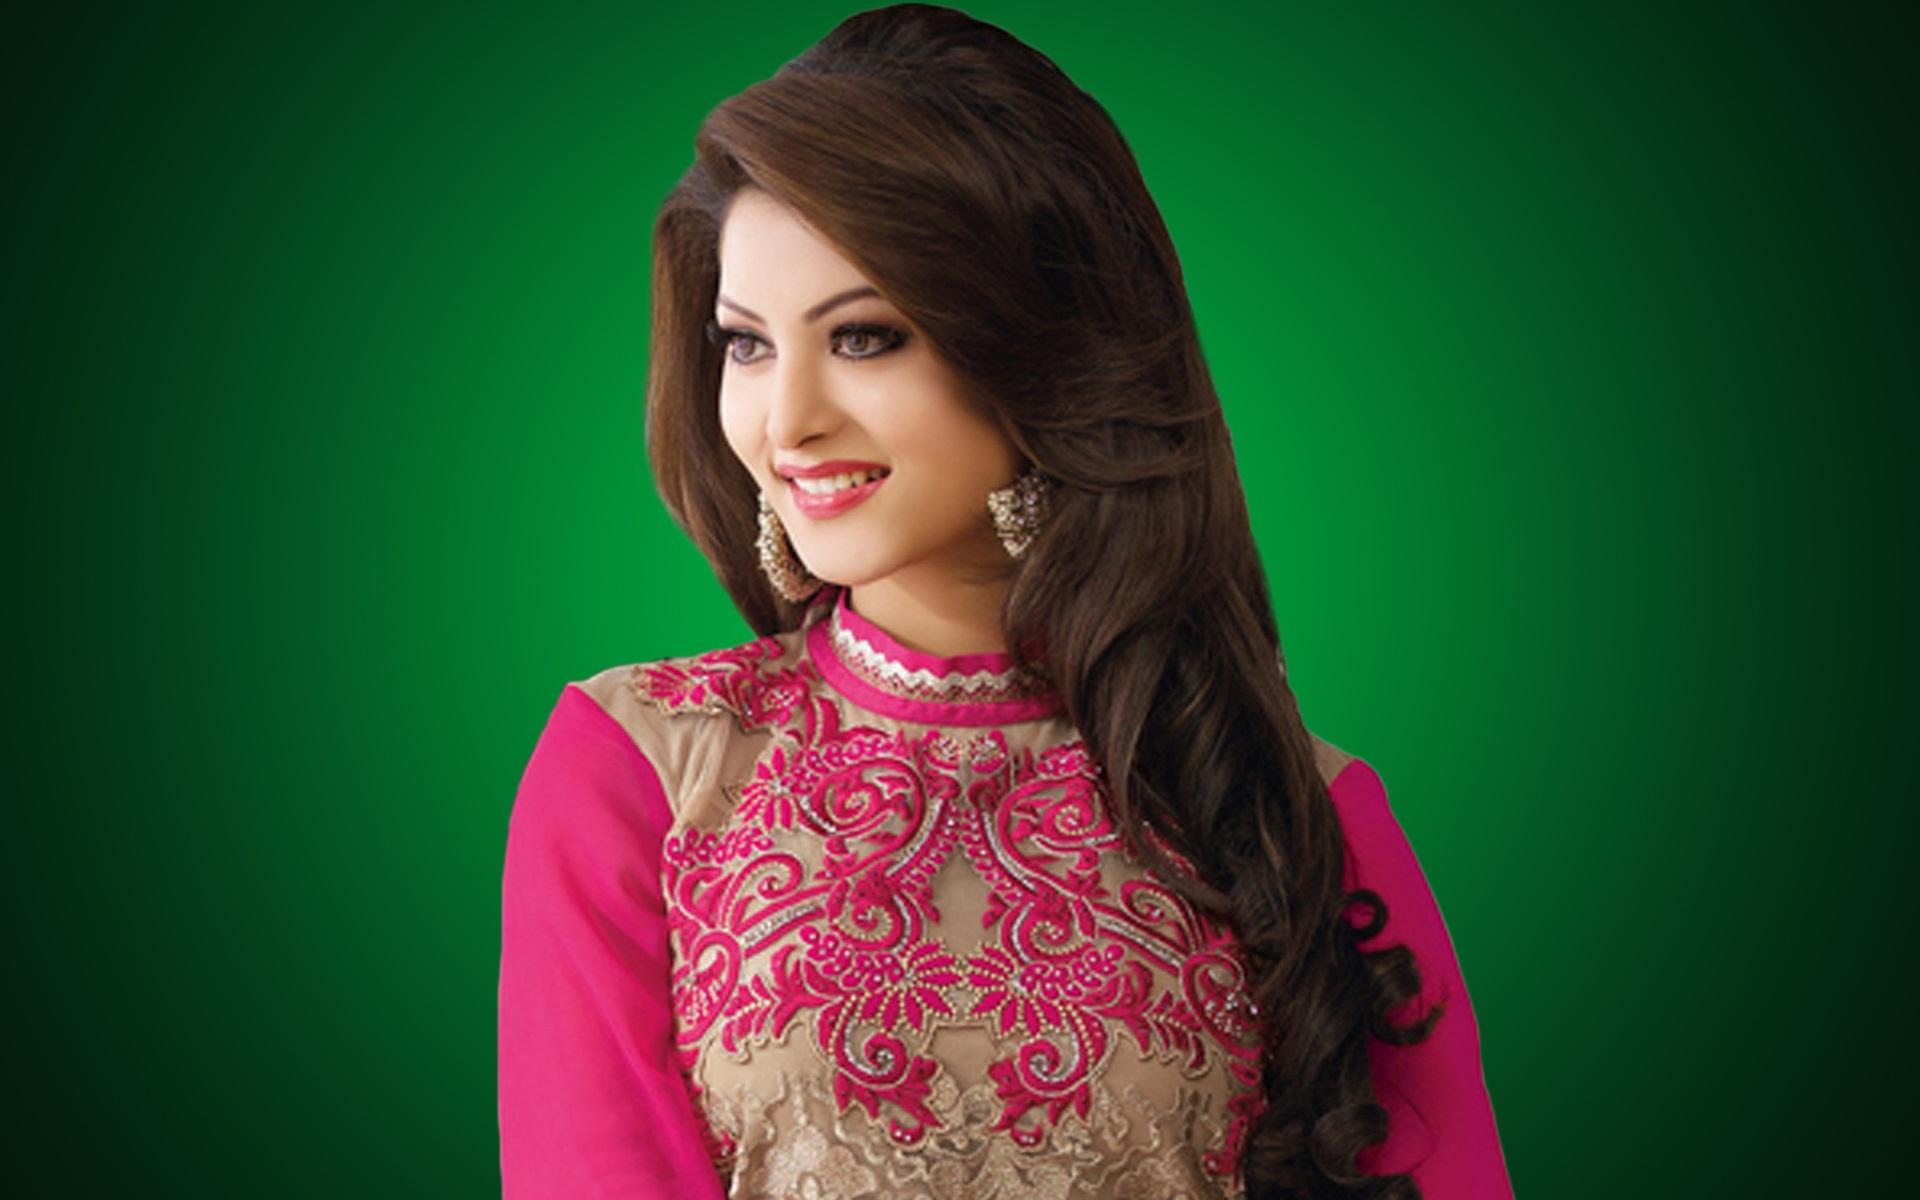 Fashion full hindi movie free download 7